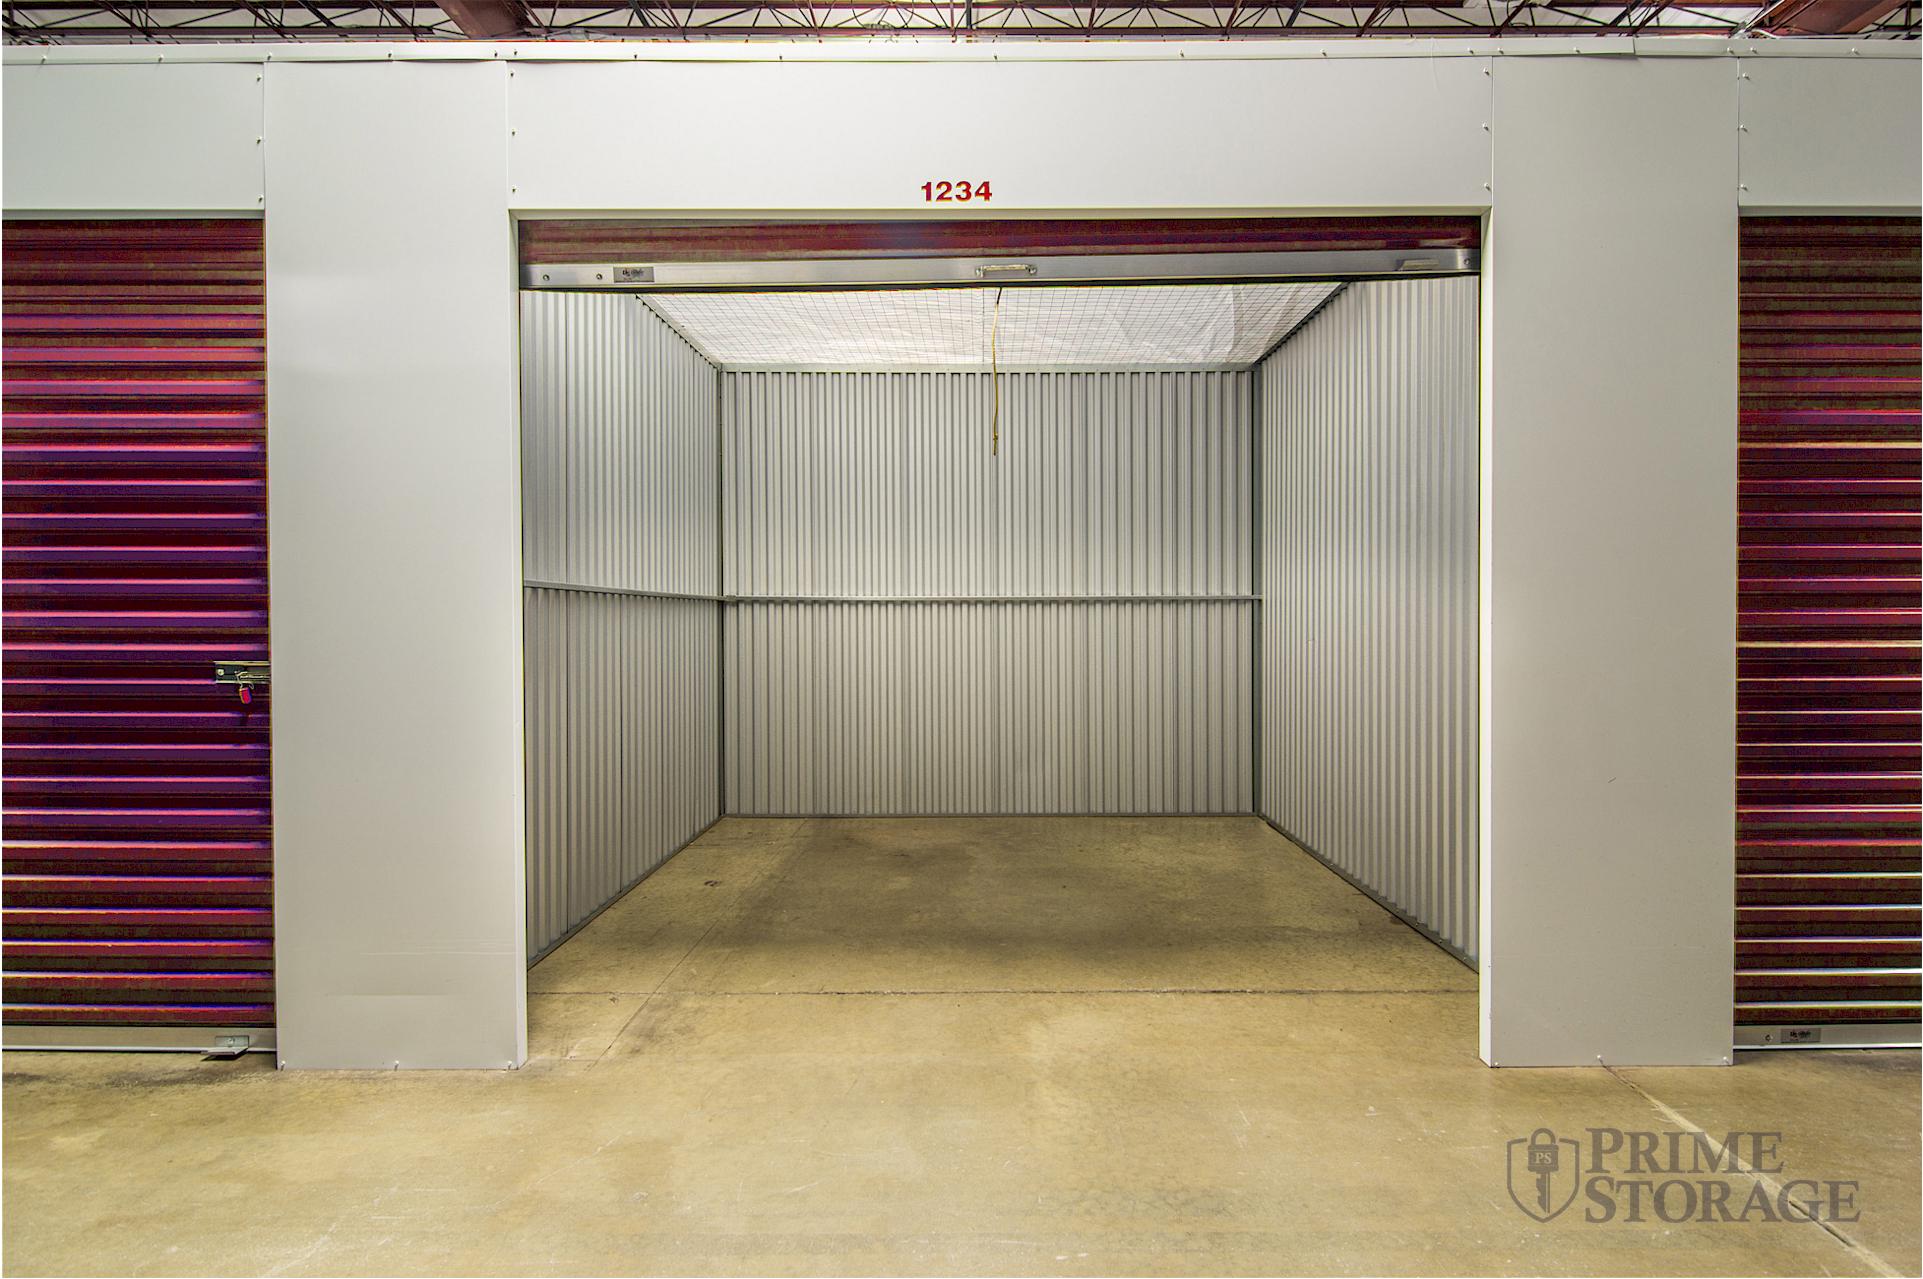 Prime Storage image 5